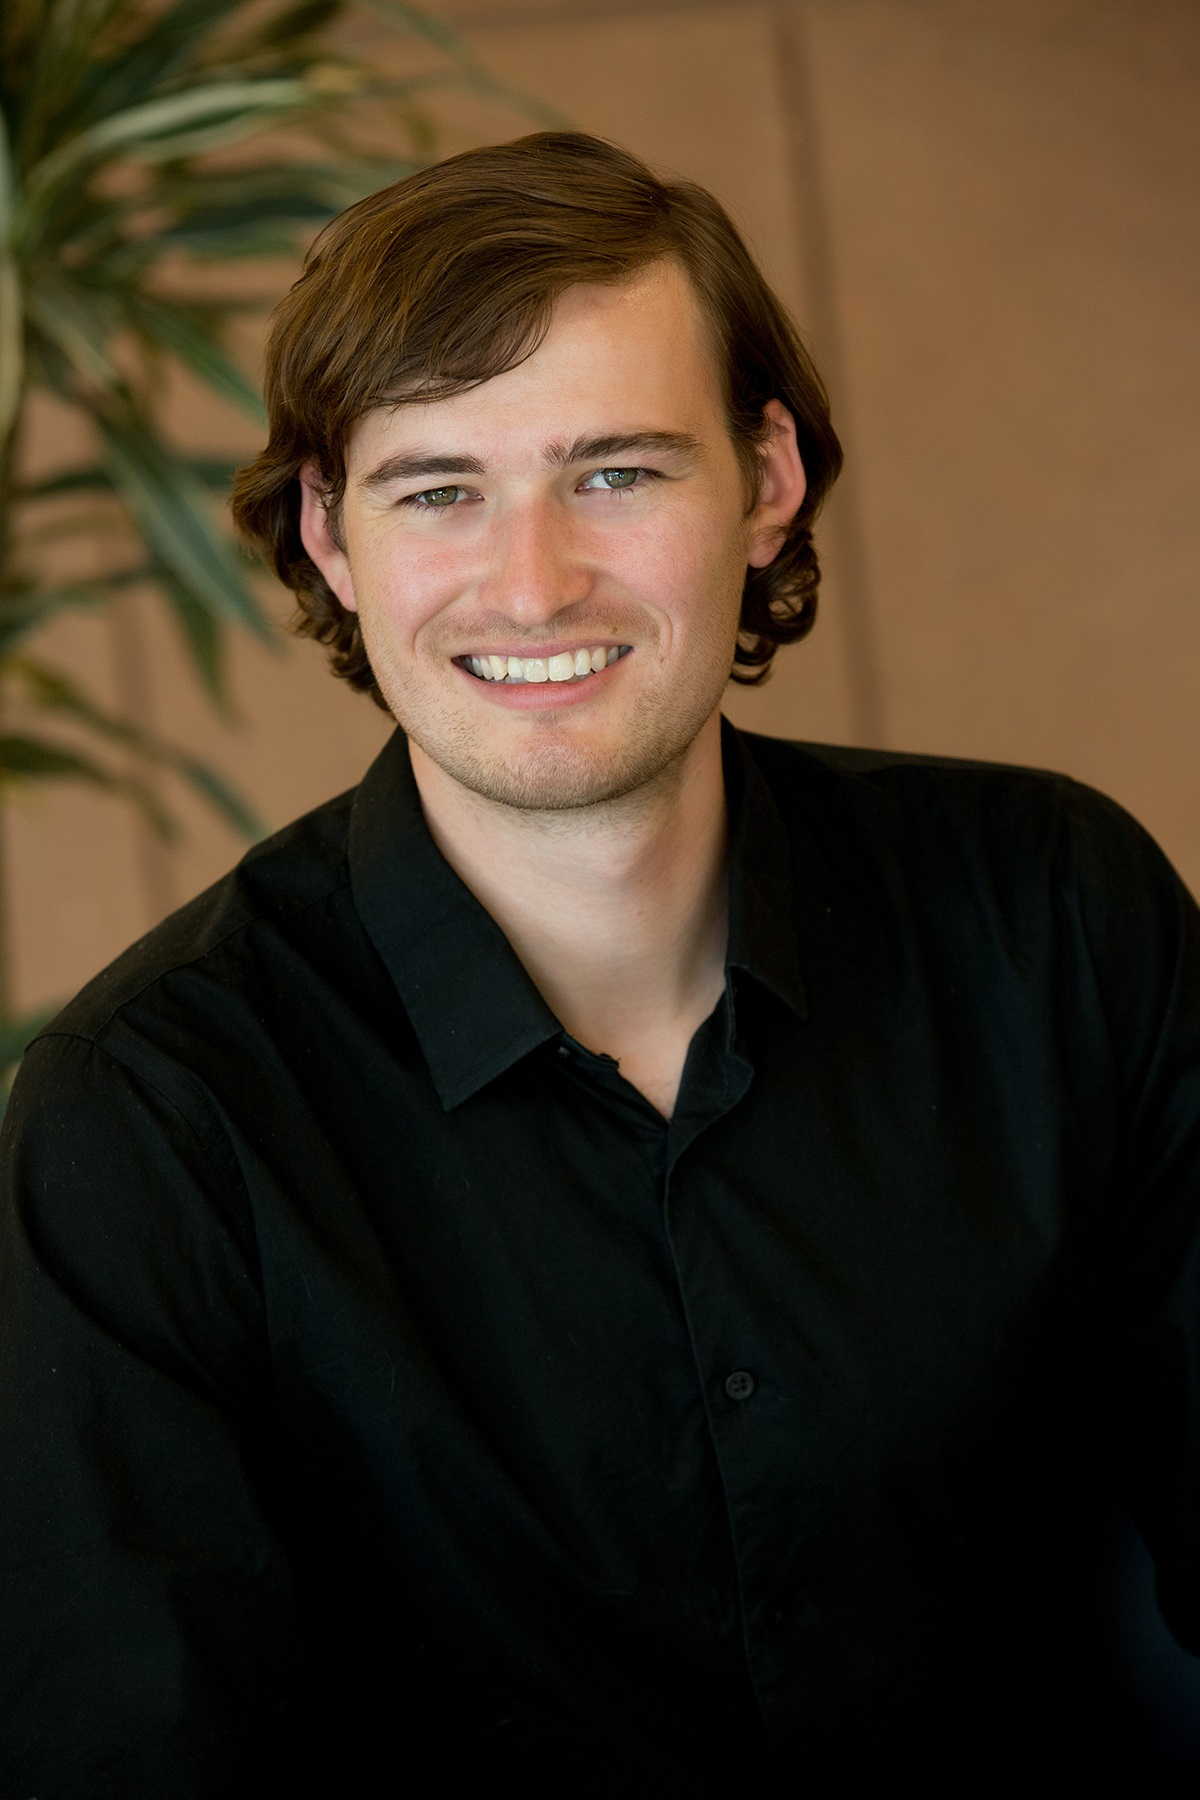 Copy of Chris Fehn, P.G., EI, Senior Engineer at Lytle Water Solutions